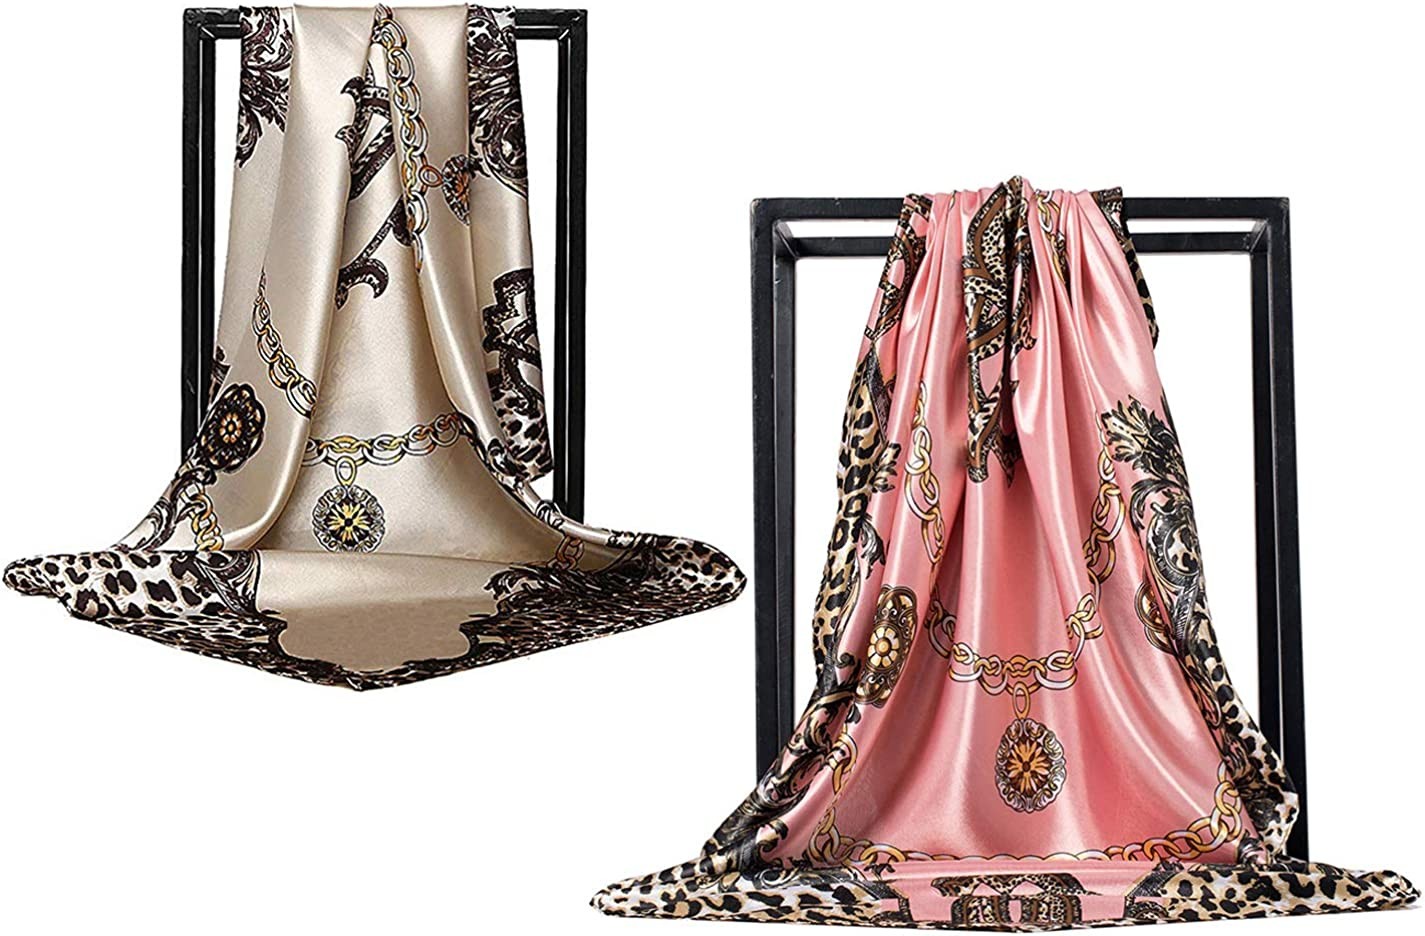 ZDMHSH Silk Like Scarf Women's Fashion Pattern Large Square Satin Headscarf